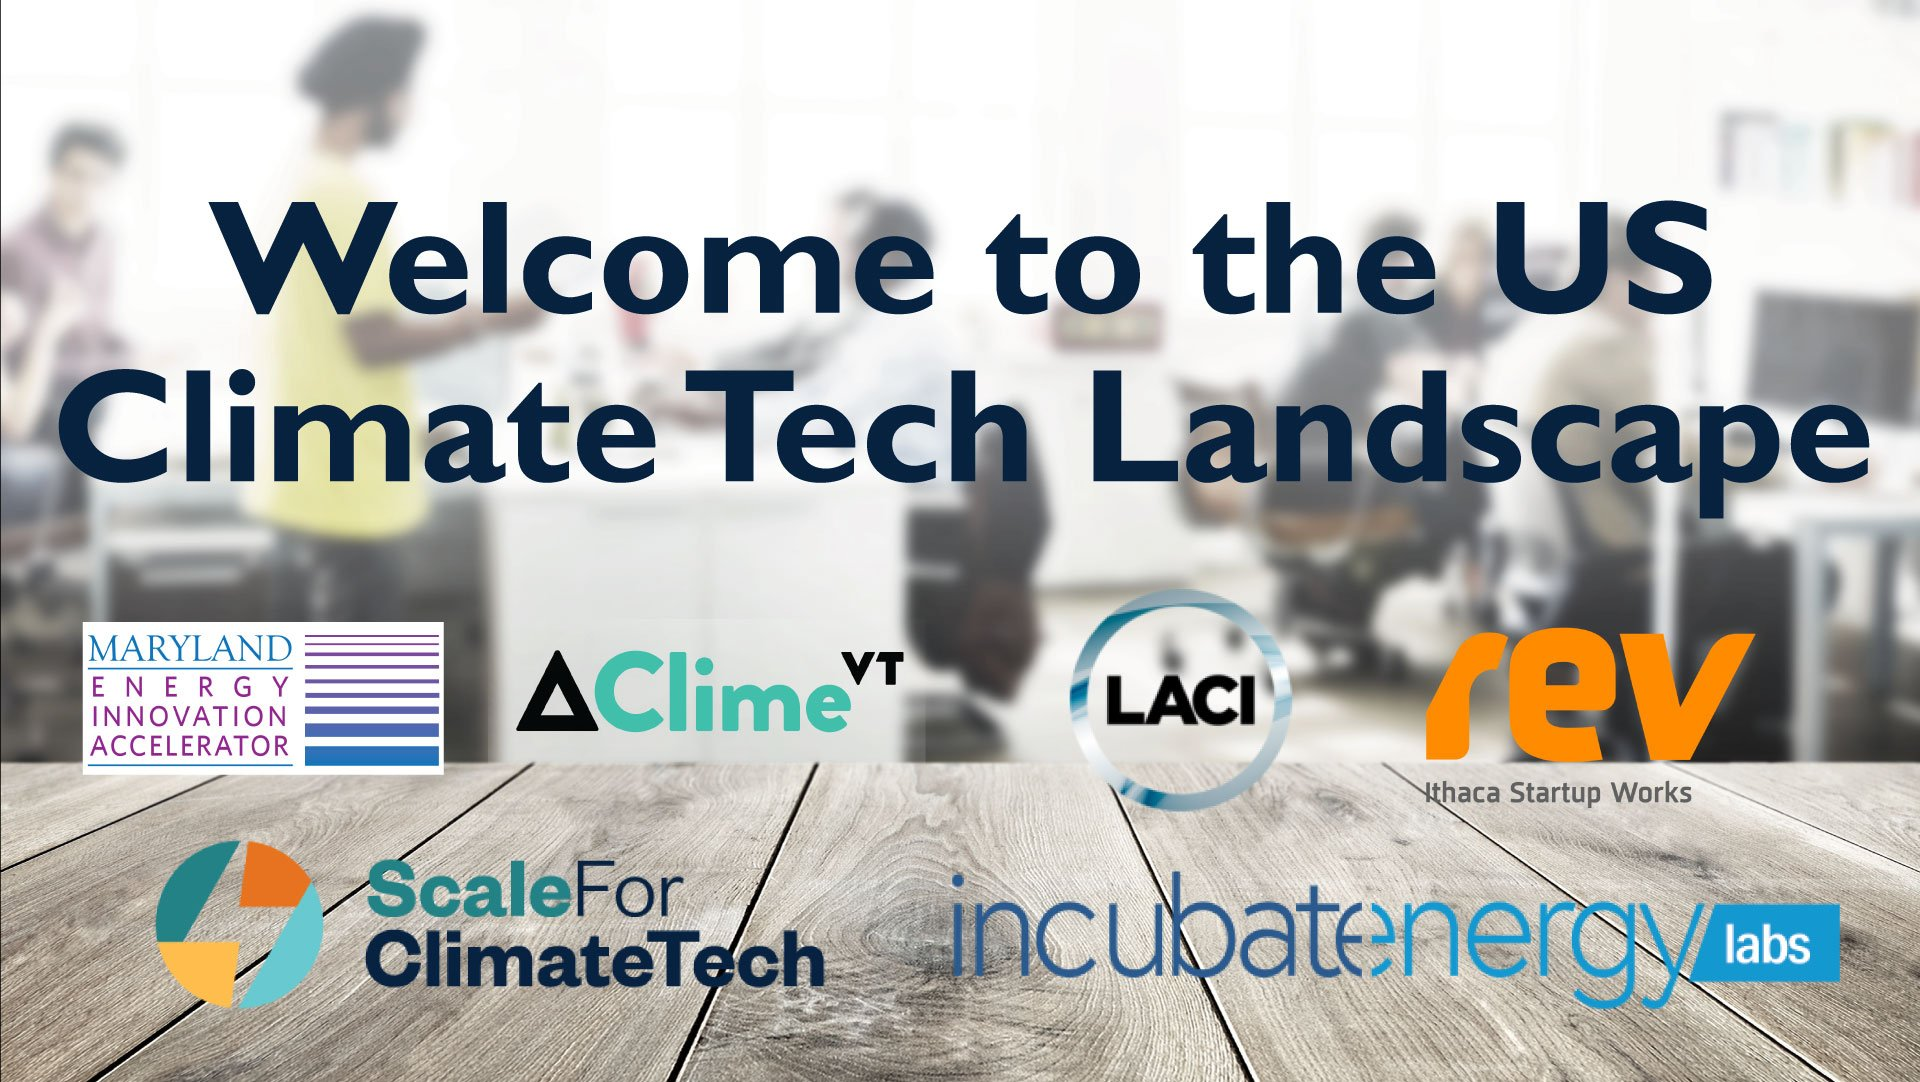 ClimateTechLandscape_rev2-WebsiteImage